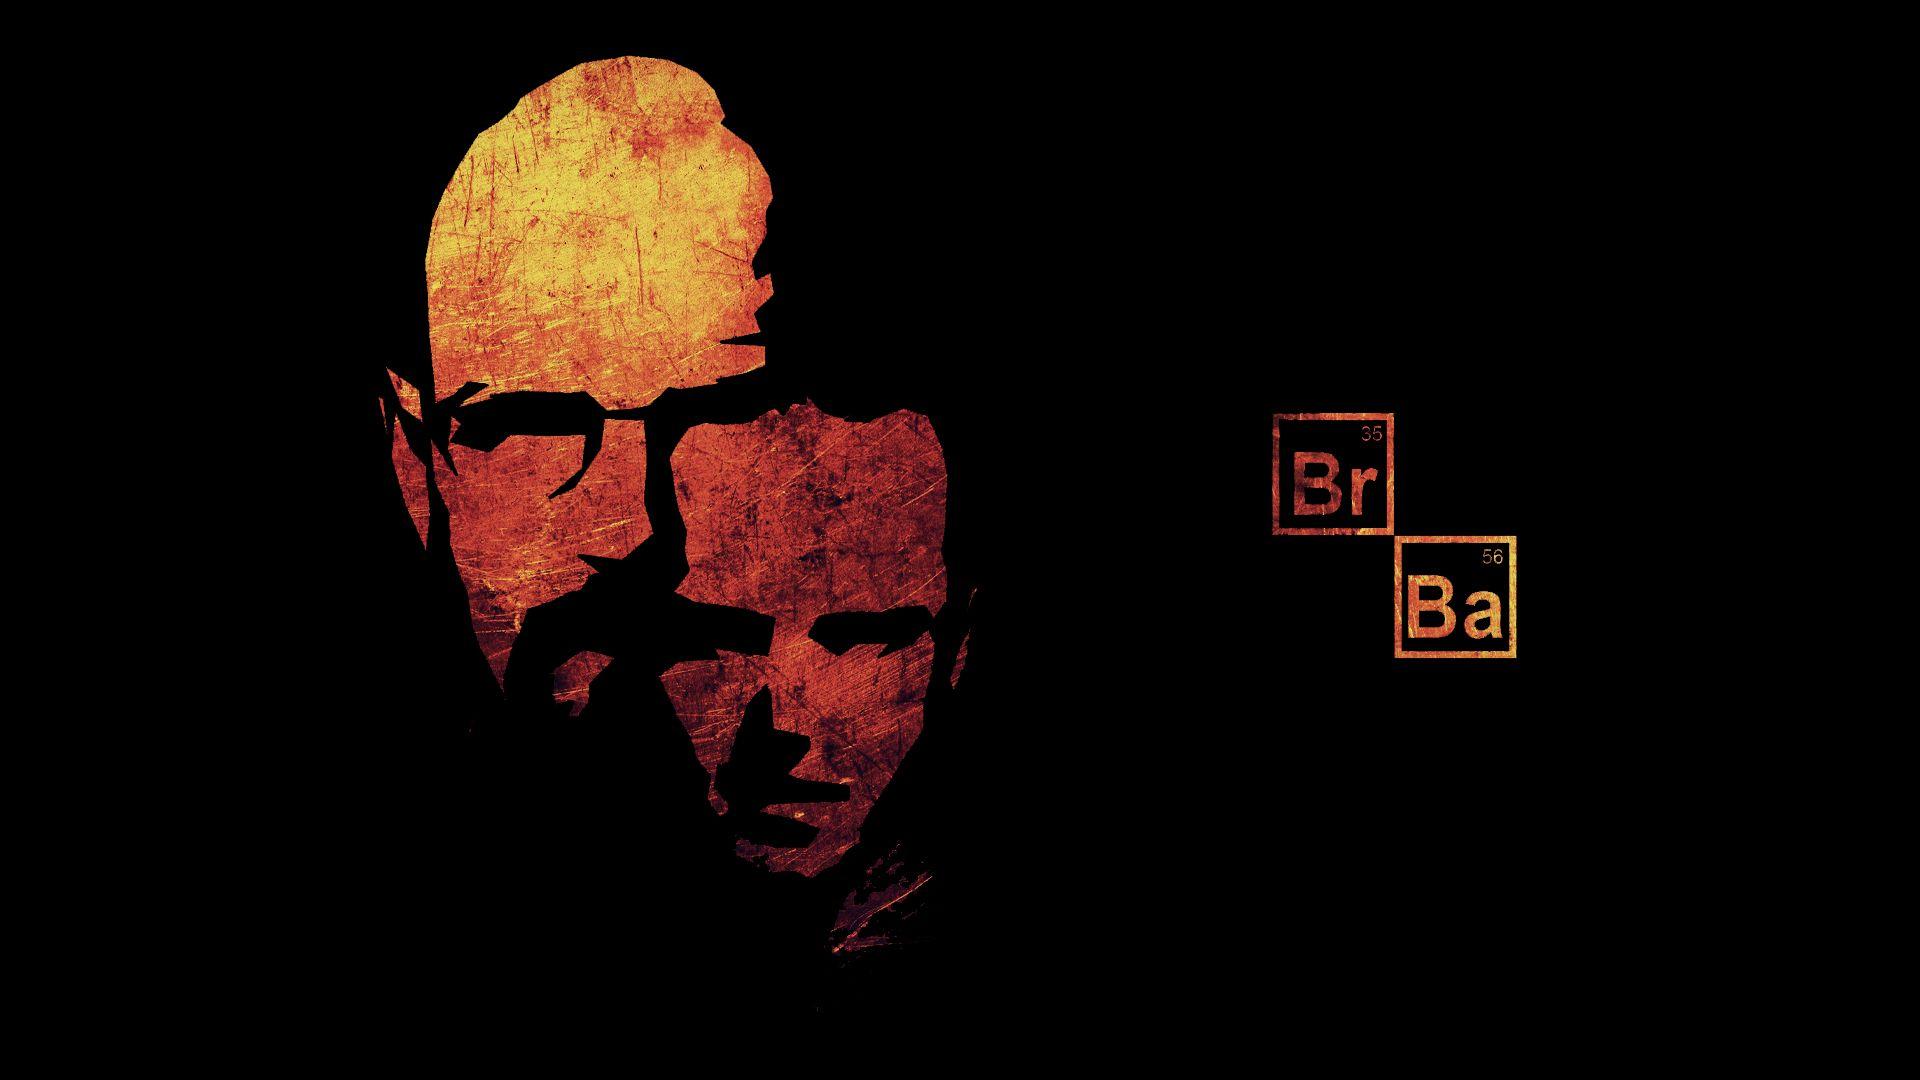 Breaking Bad Breaking Bad Hd Wallpaper 1920x1080 Breaking Bad Breaking Bad Art Breaking Bad Shirt